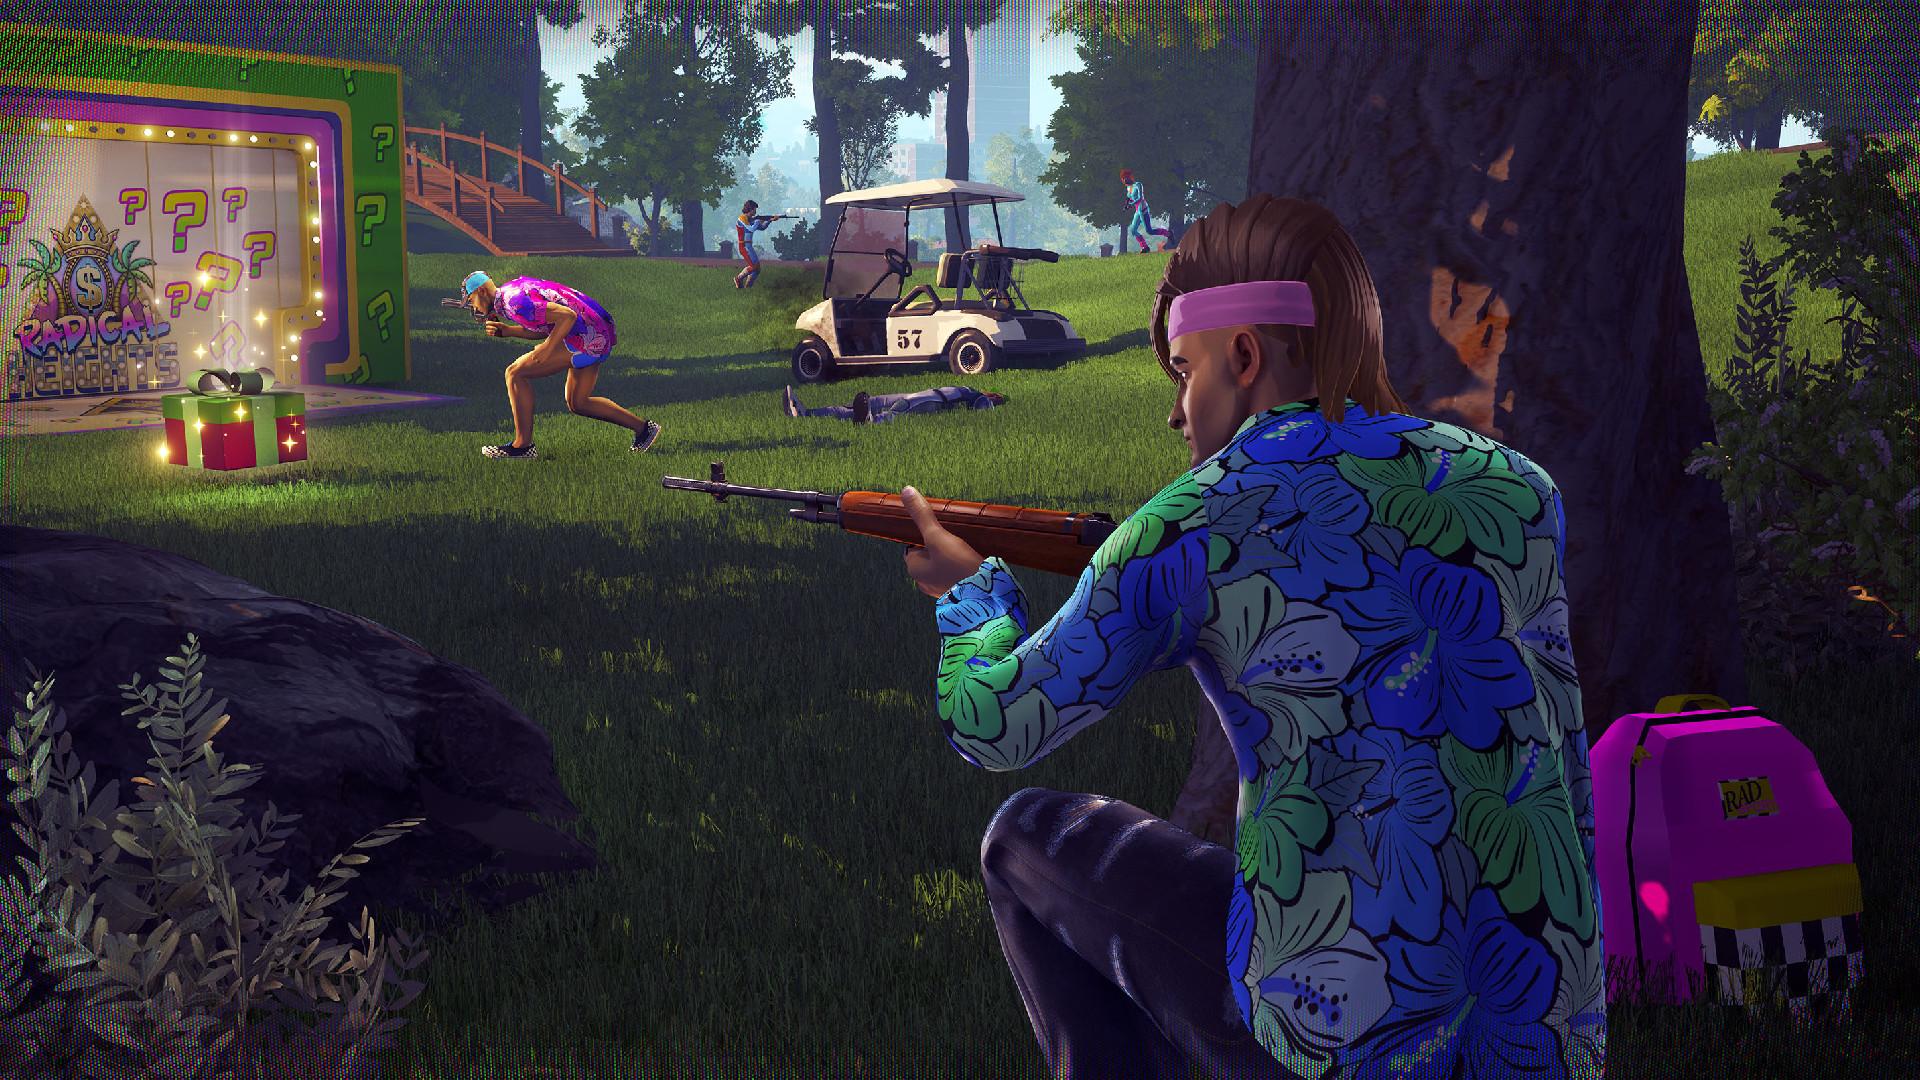 Boss Key S Radical Heights Reportedly Already Surpassed Lawbreakers Concurrent Peak Player Count On Steam Rumor